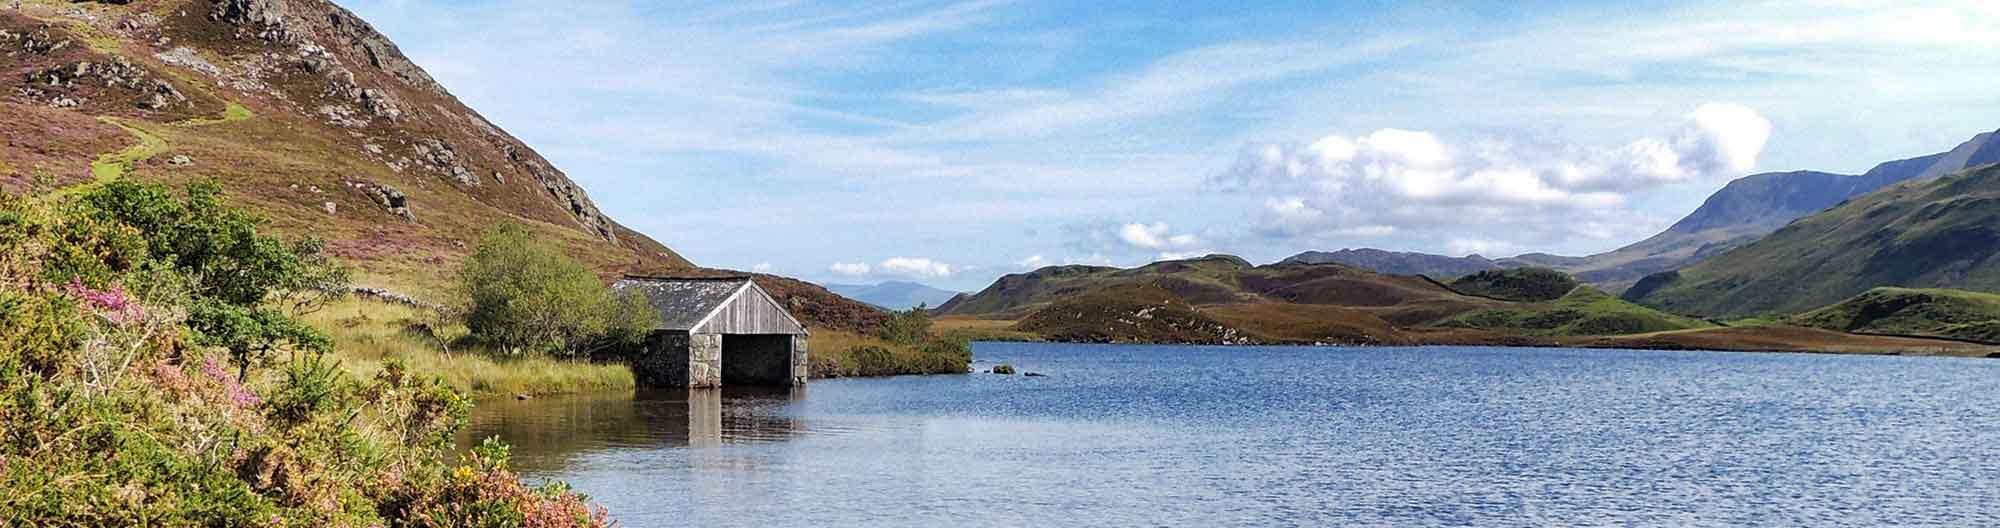 Cregennen Lakes 2